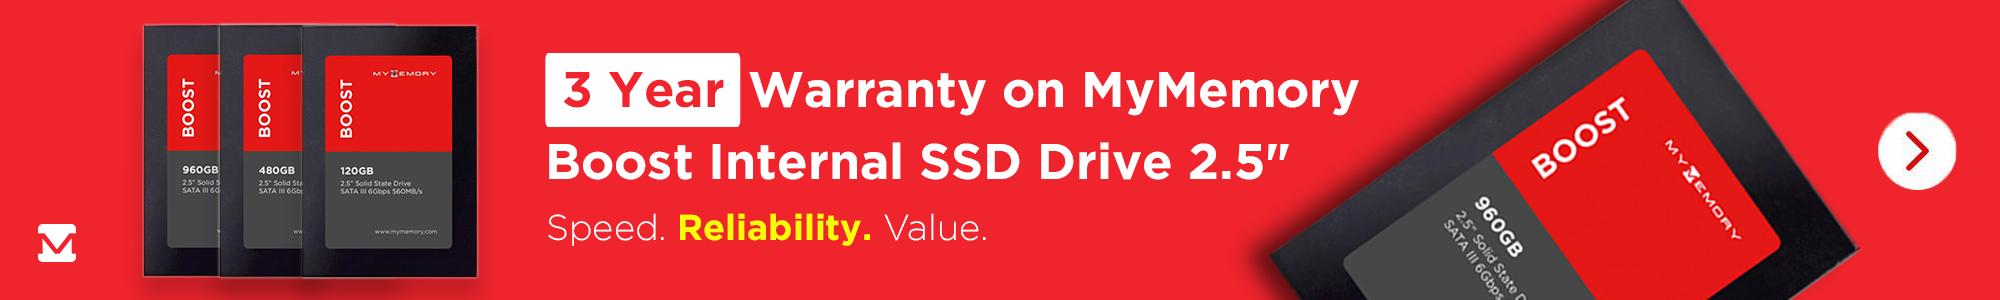 3 Year Warranty on MyMemory Boost SSD!